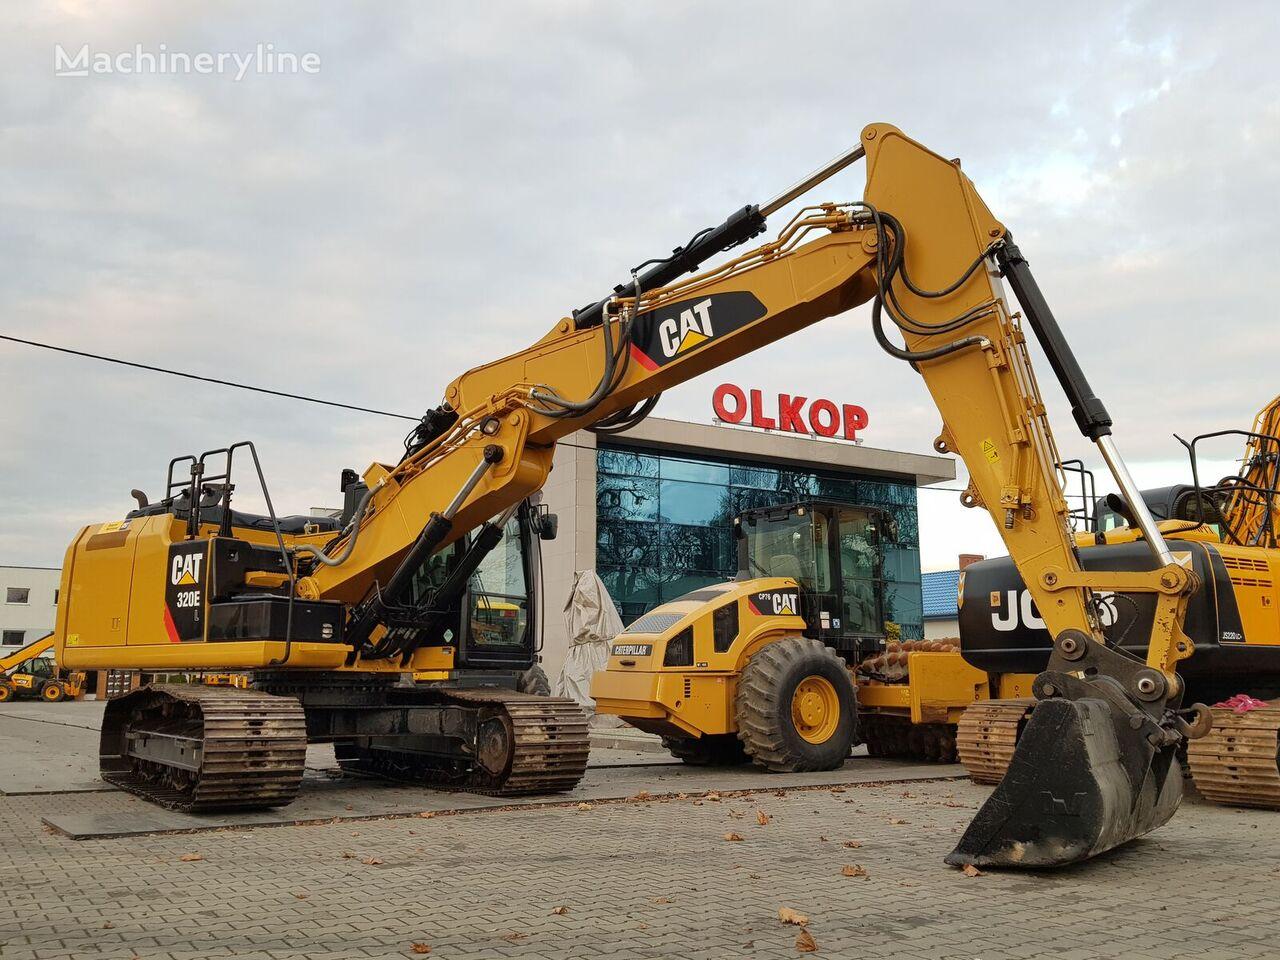 CATERPILLAR 320E tracked excavator